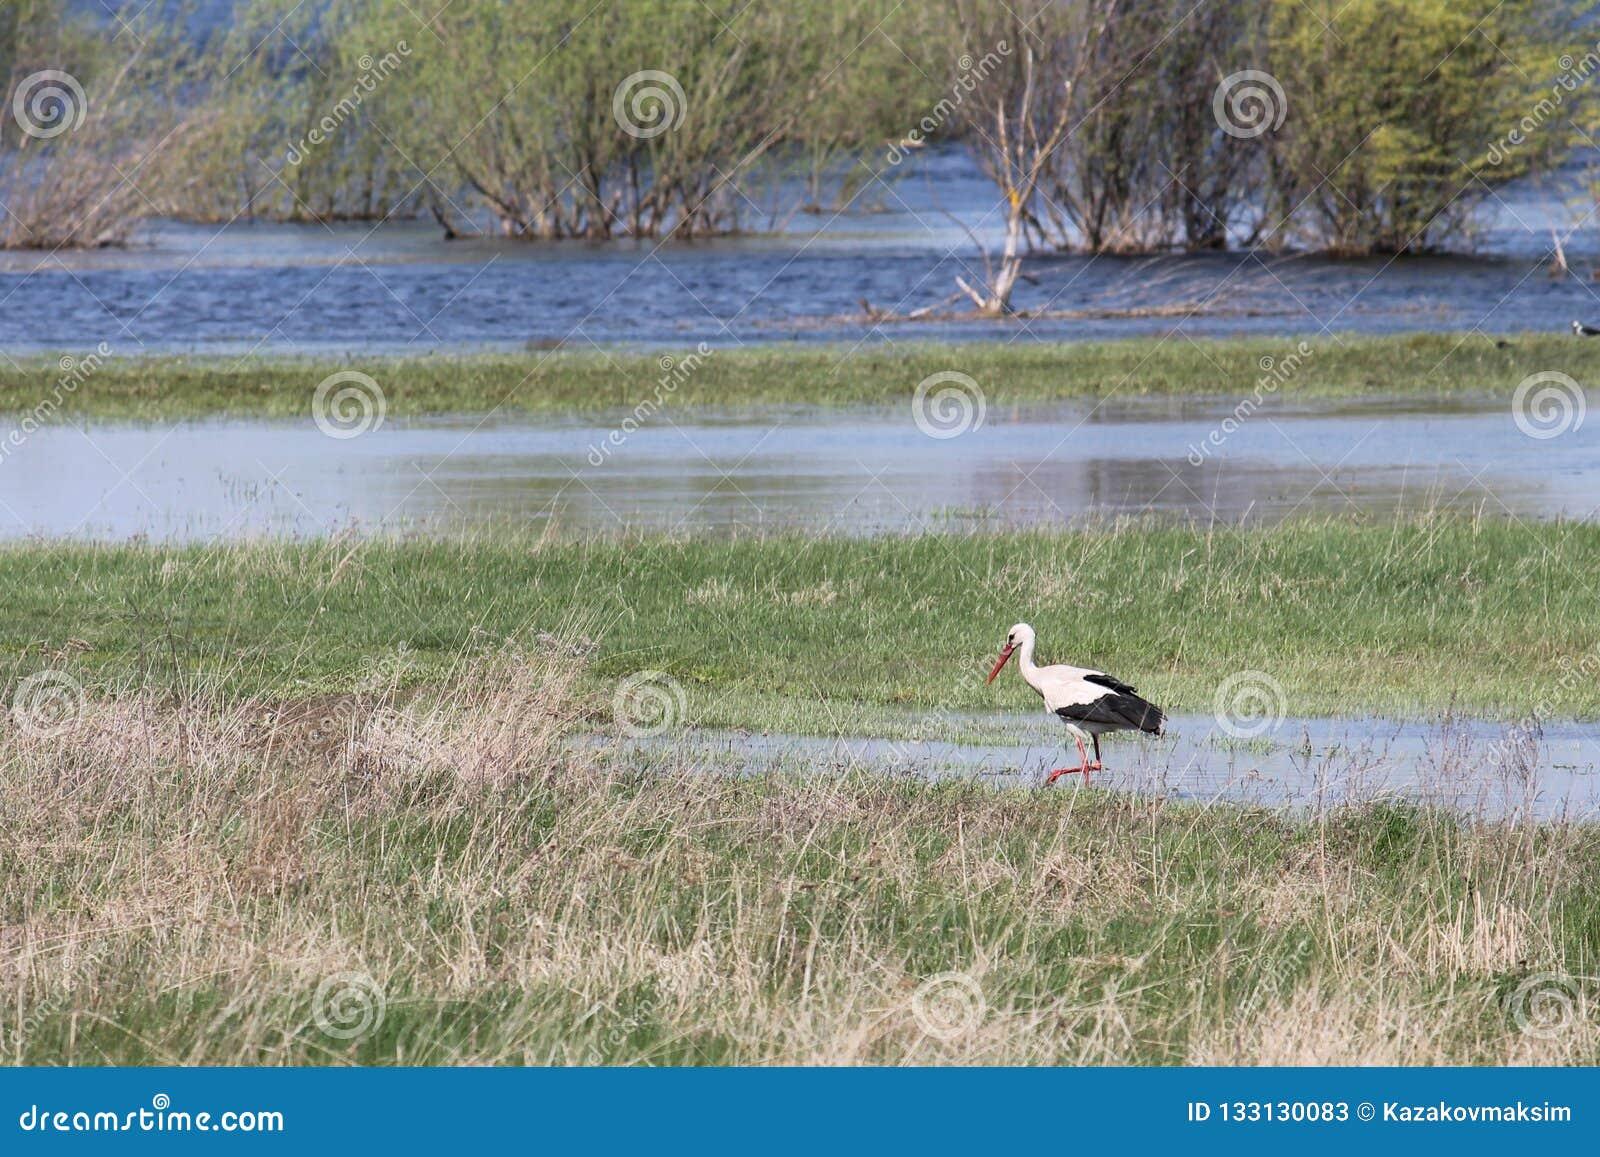 Stork and spring flooding of Pripyat River near Turov, Belarus